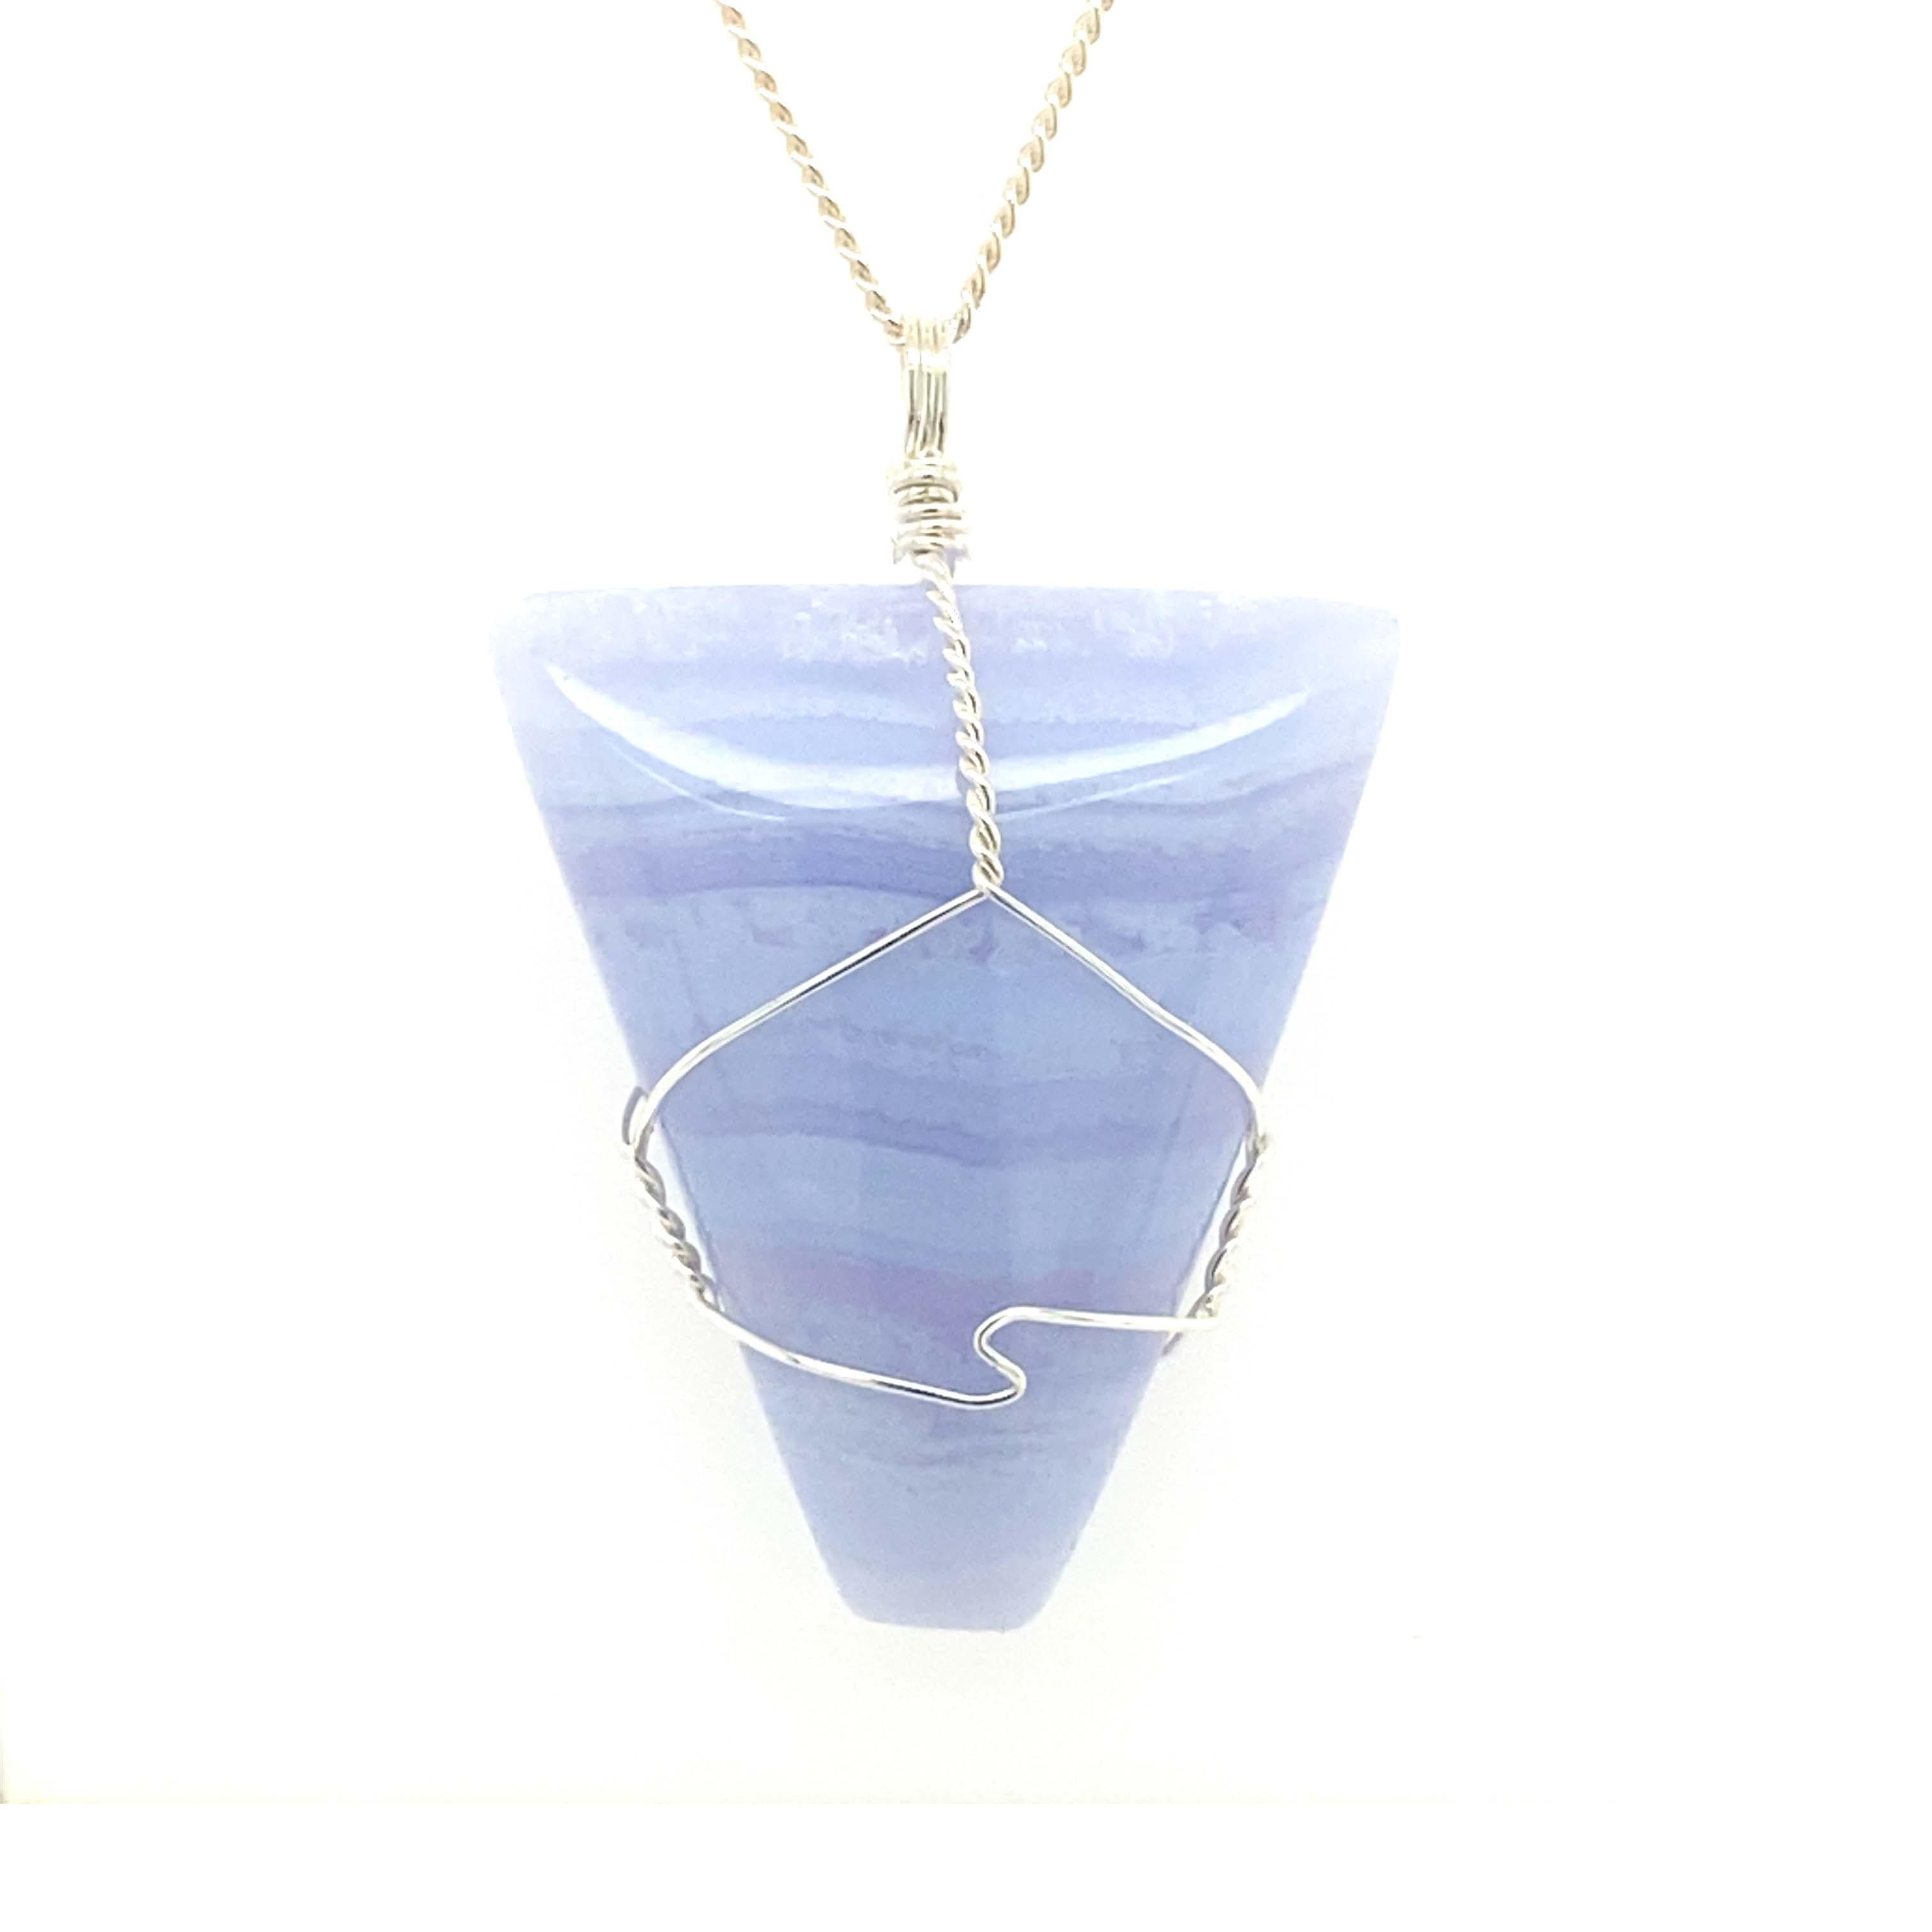 Blue Lace Agate Orb Necklace